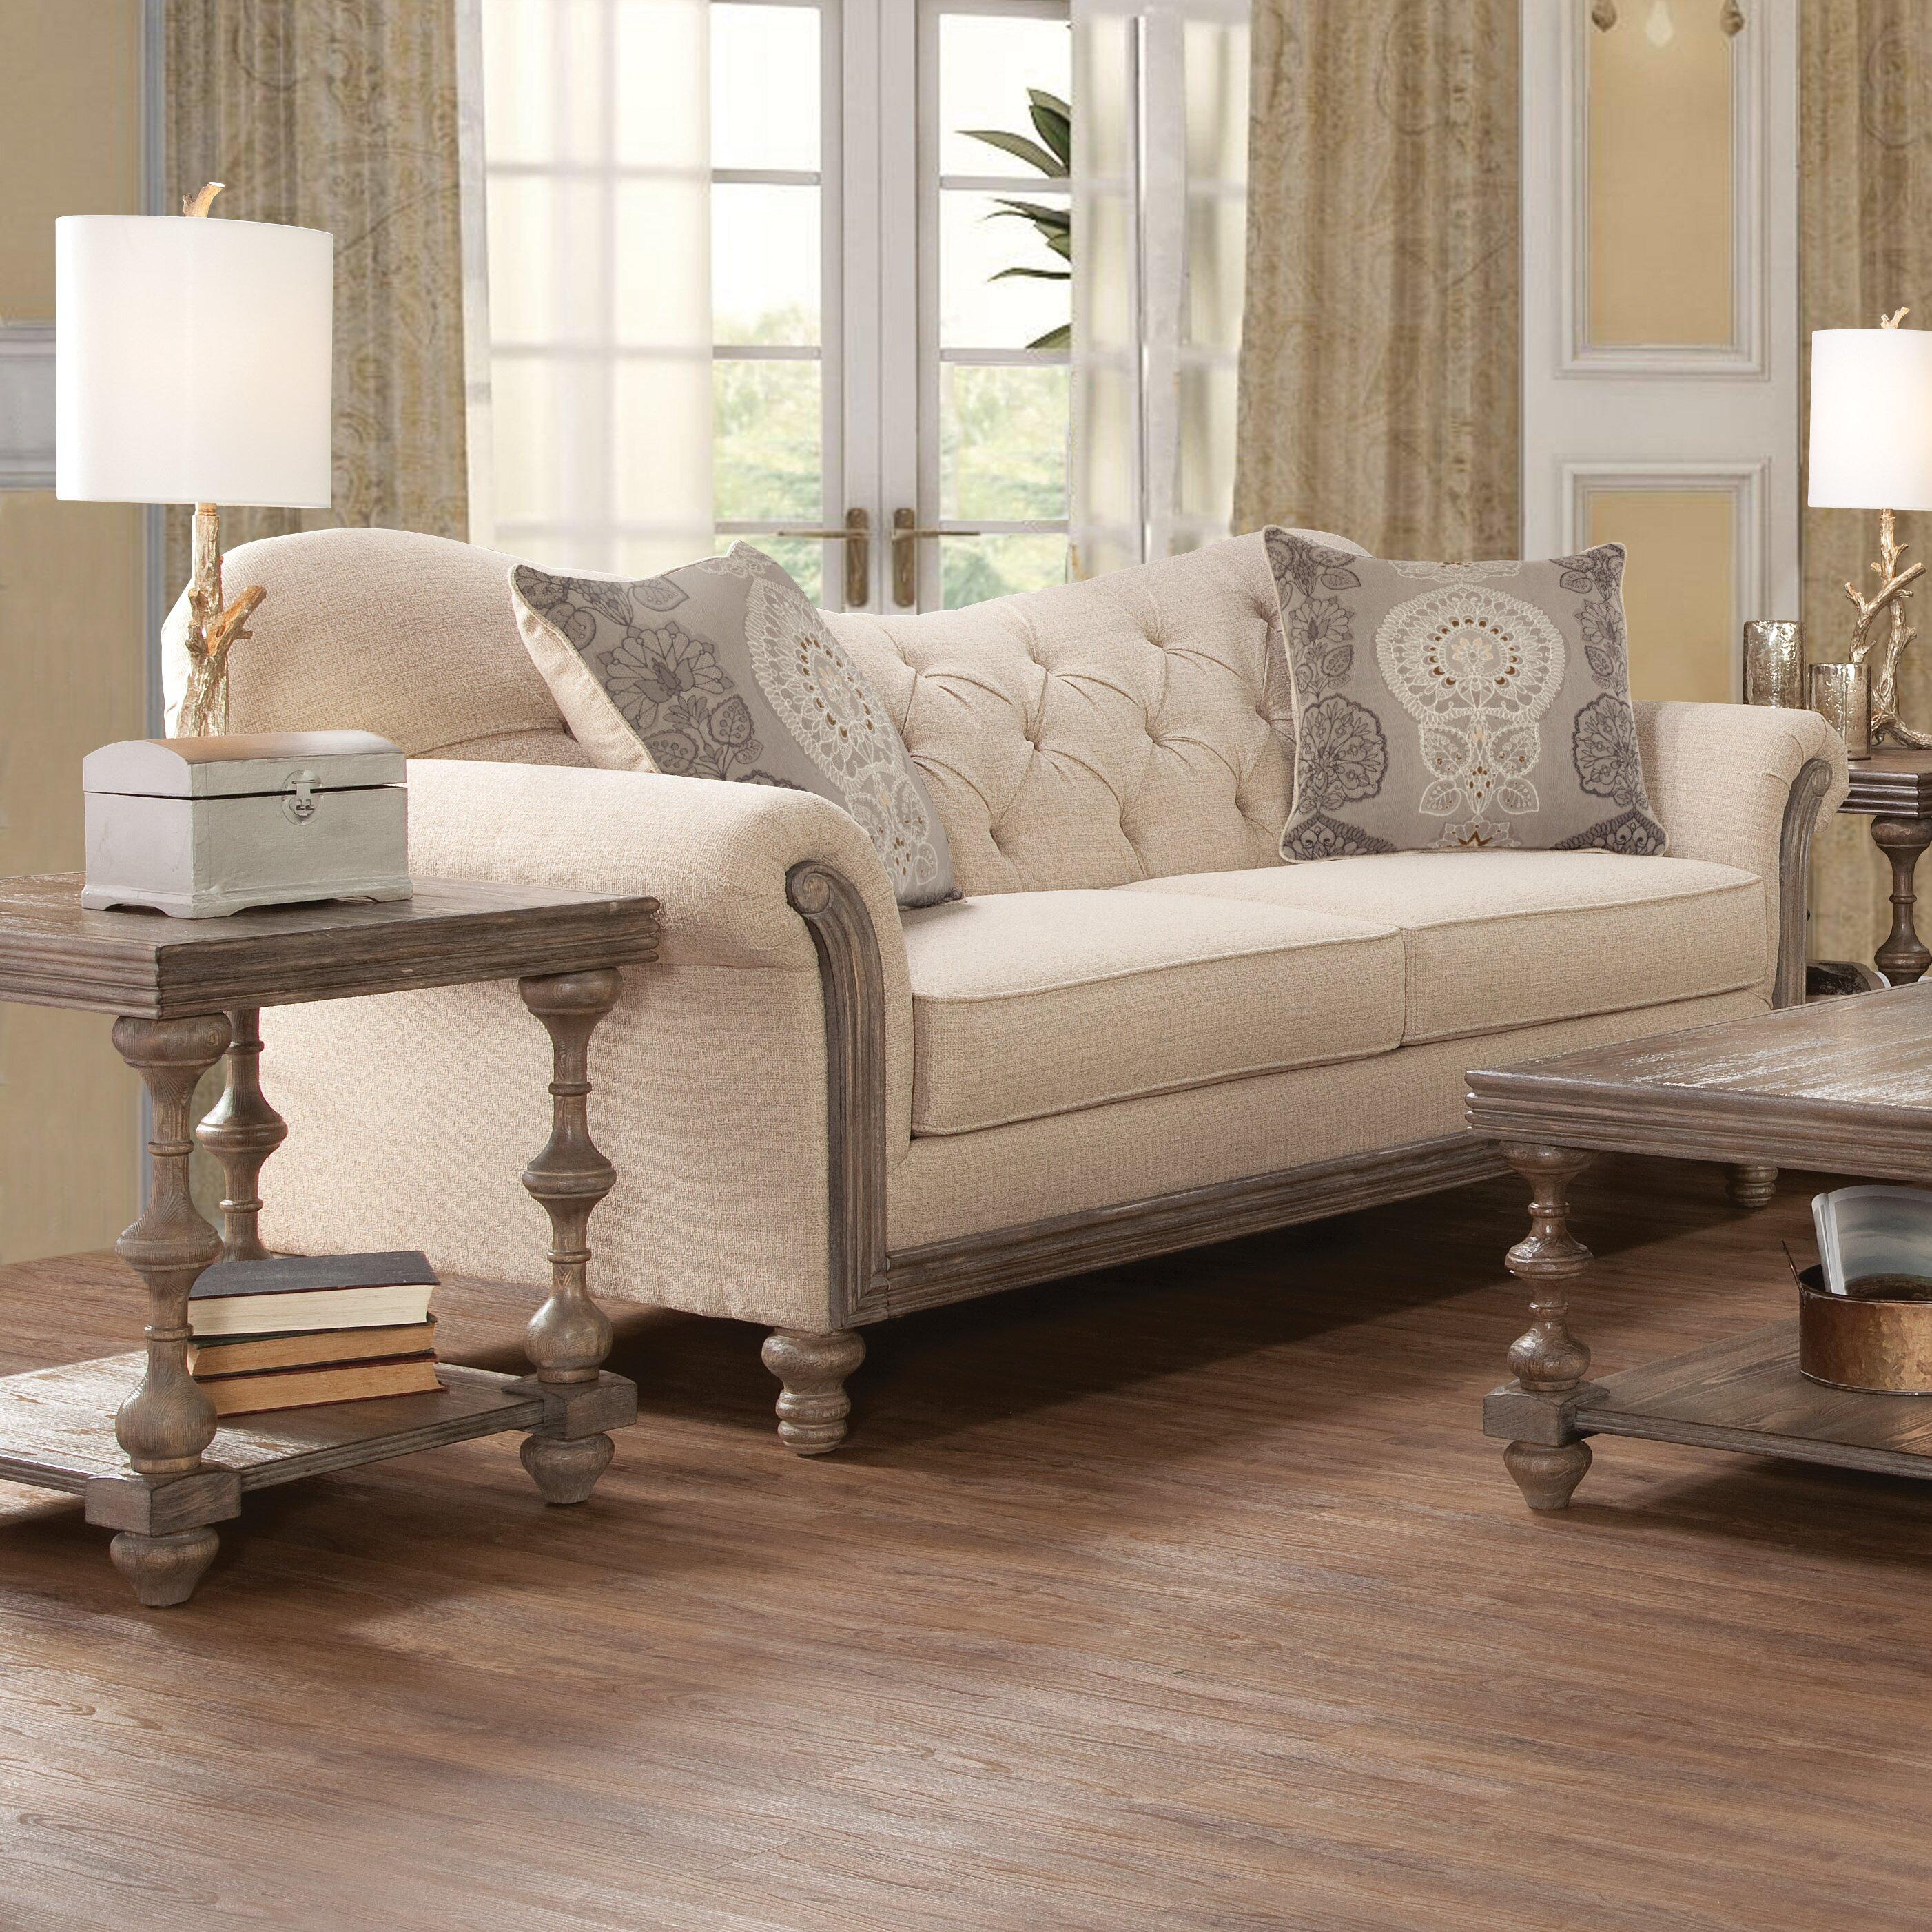 Bungalow Rose Roosa Serta Upholstery Sofa & Reviews   Wayfair